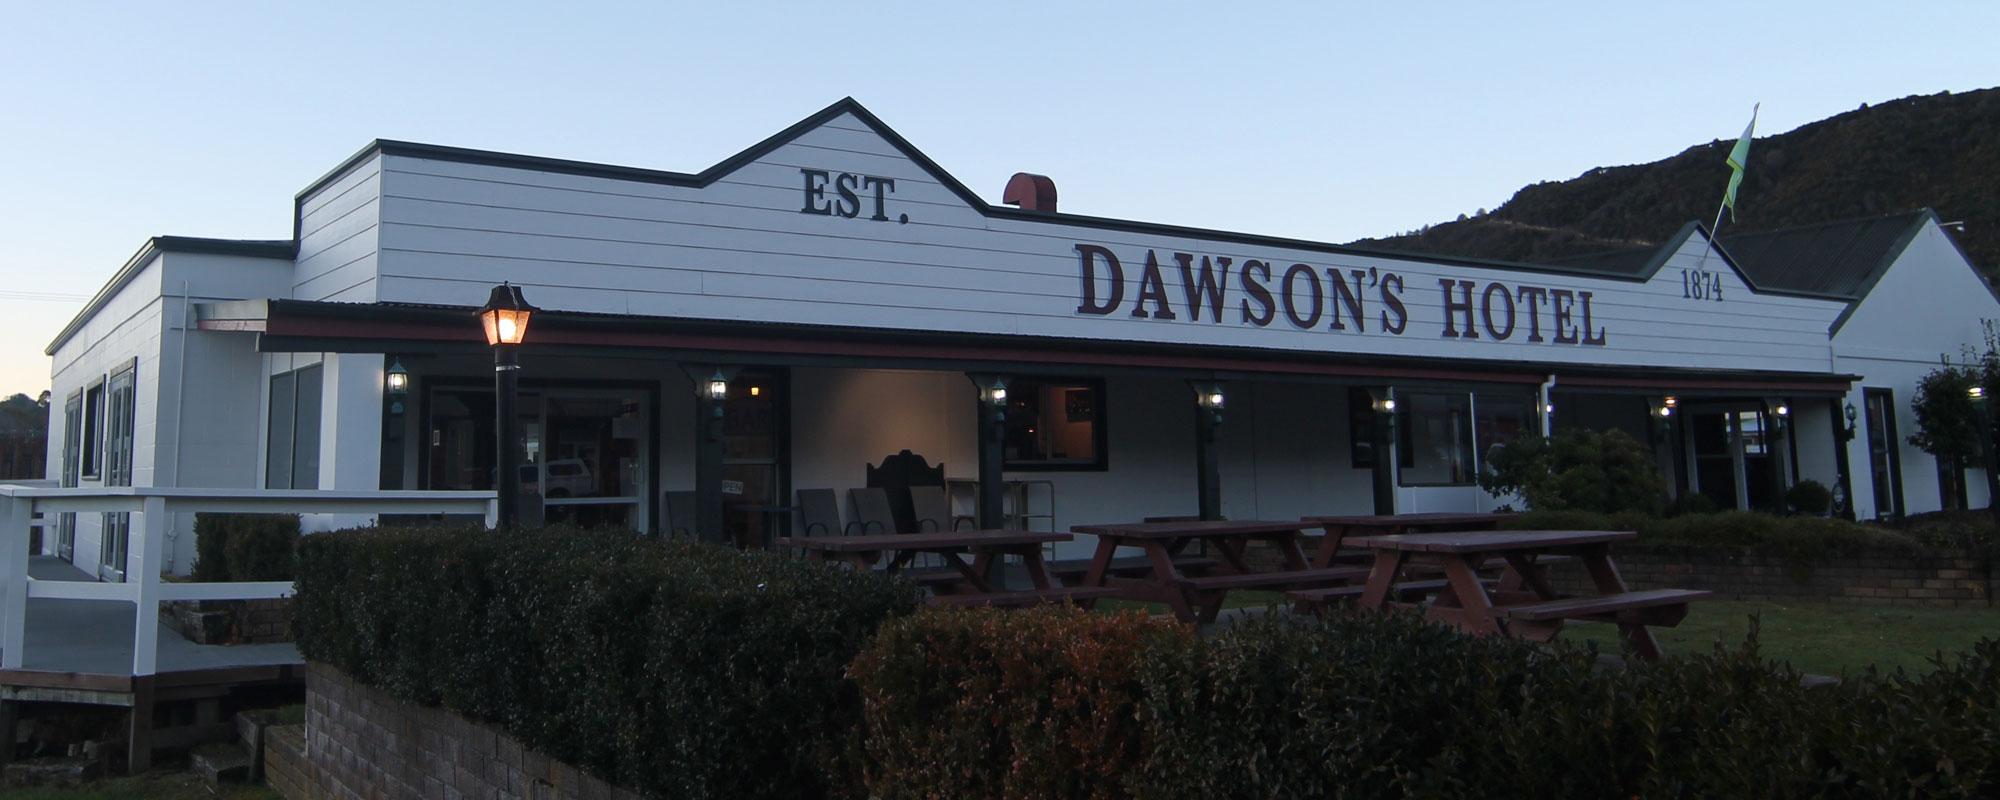 Dawsons Hotel - Accommodation, Restaurant and Bar